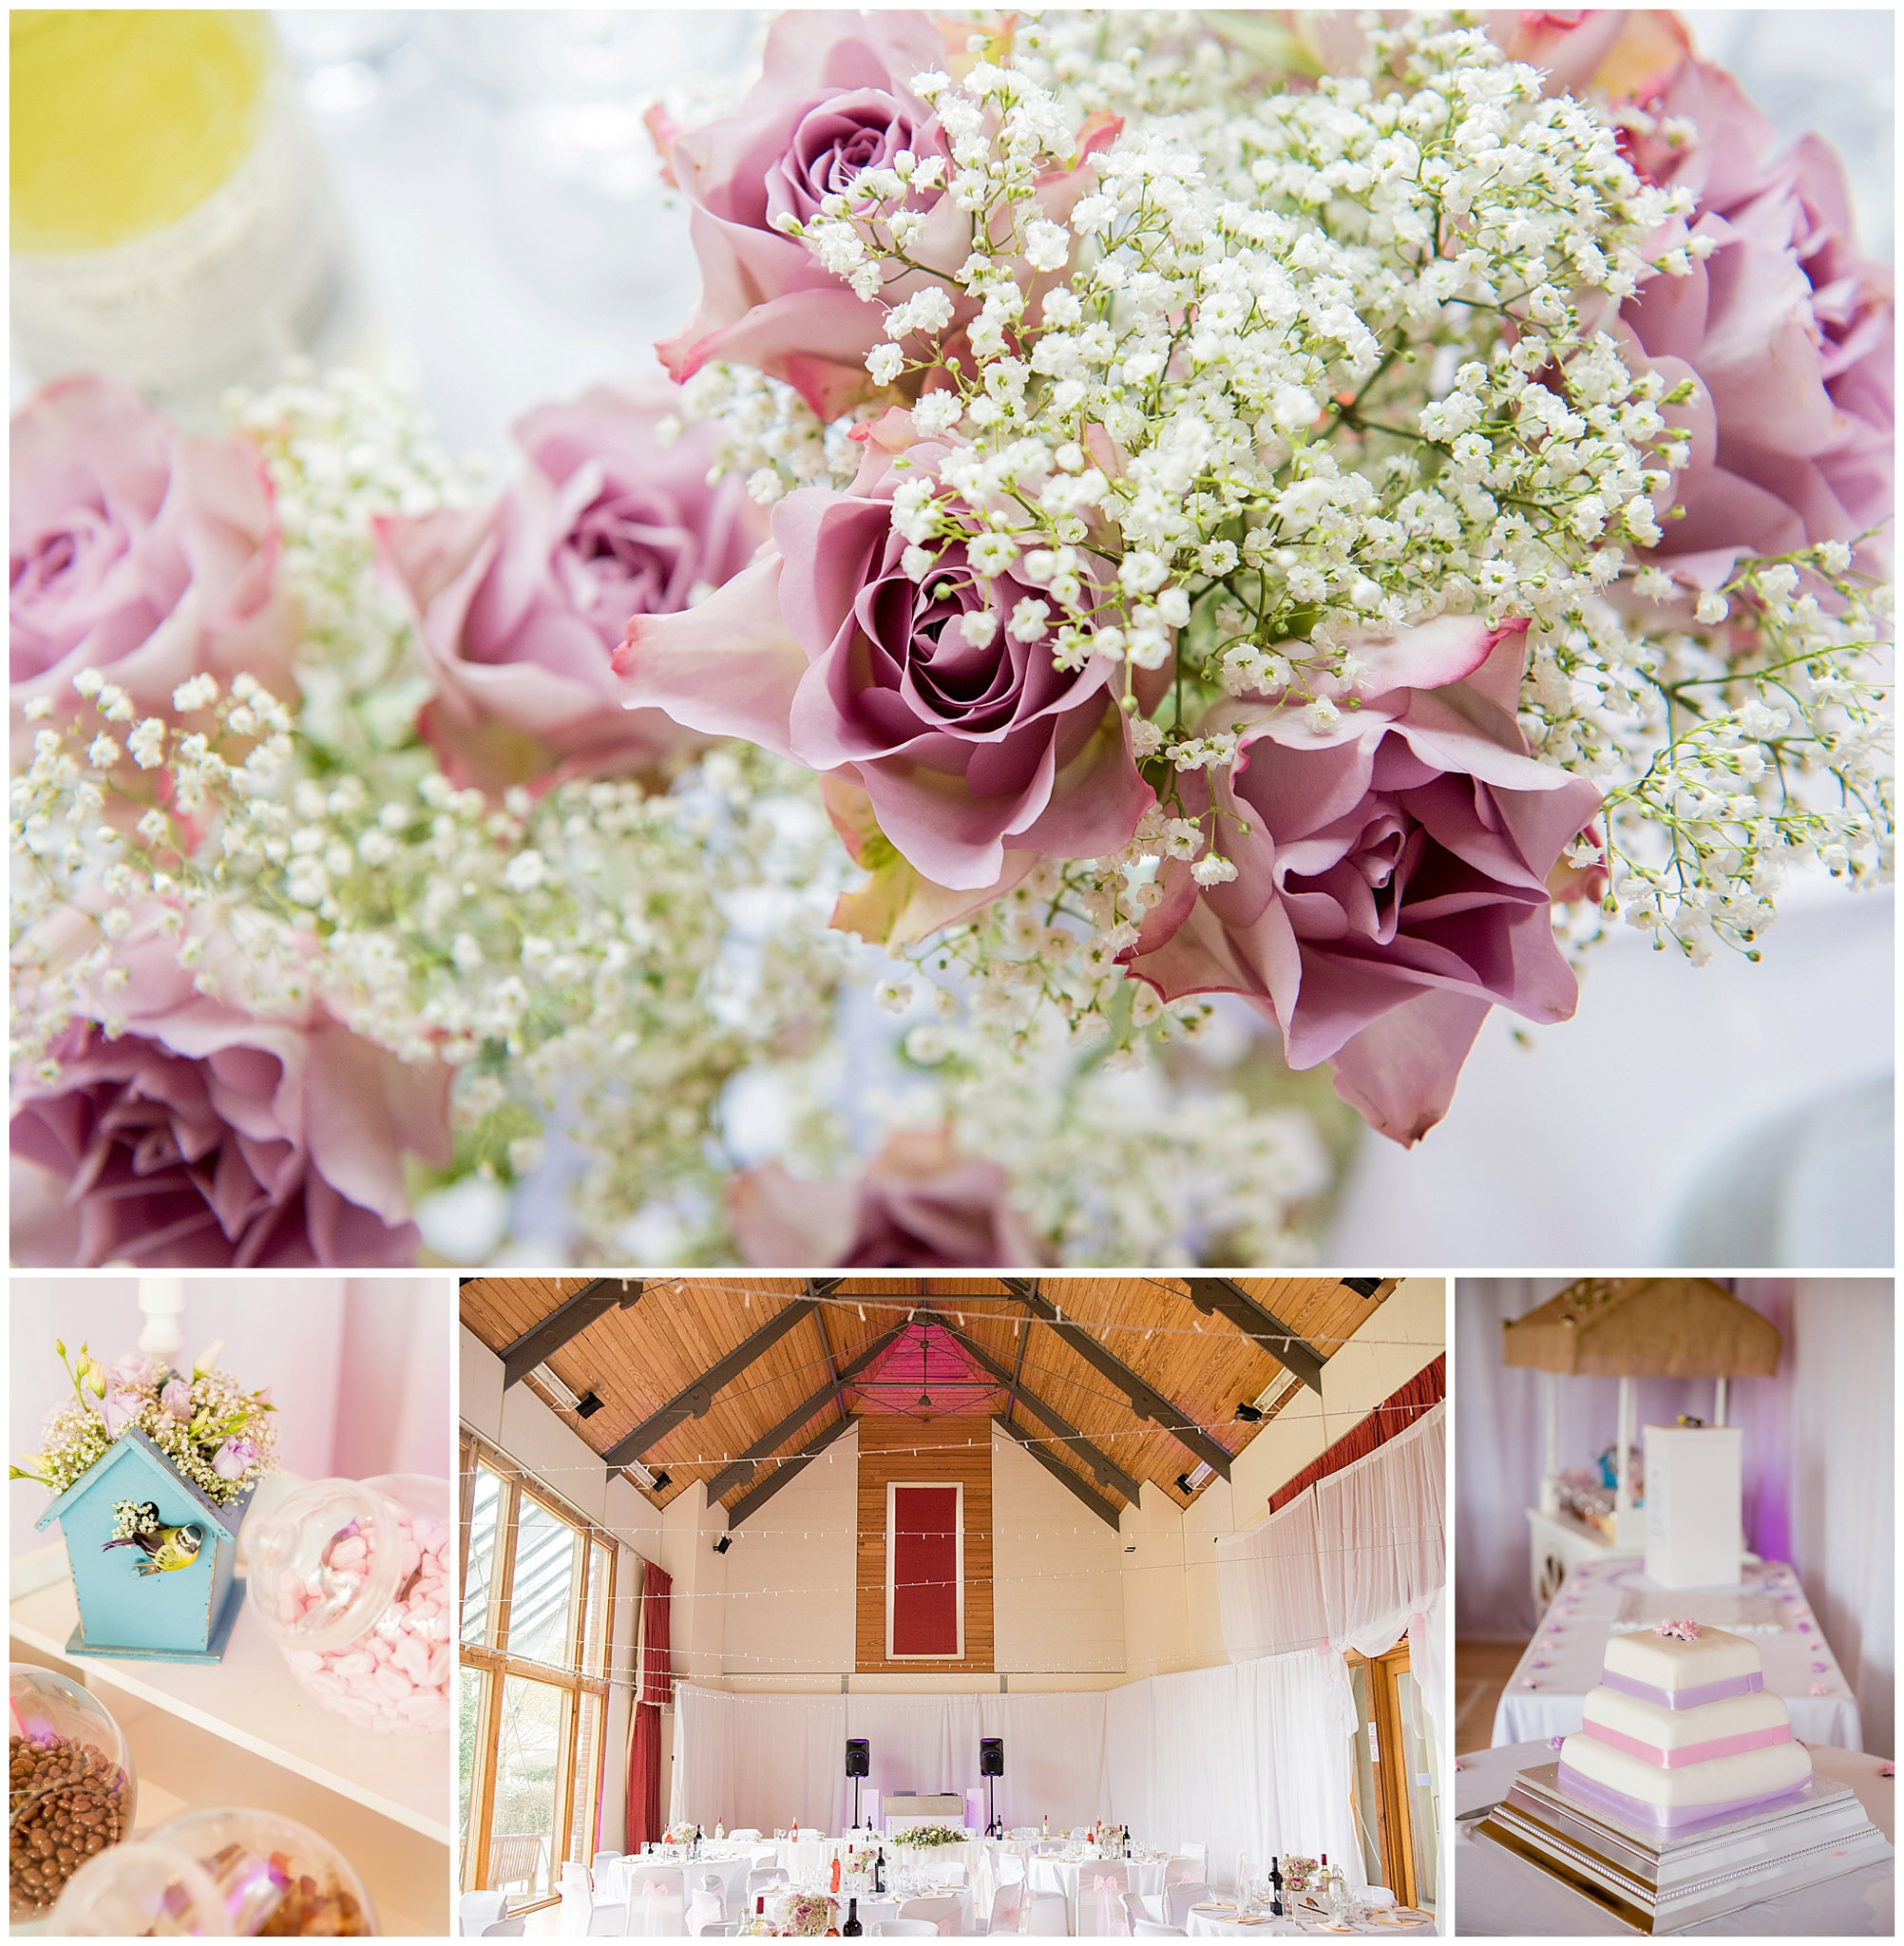 Itchen Abbas Village Hall wedding reception